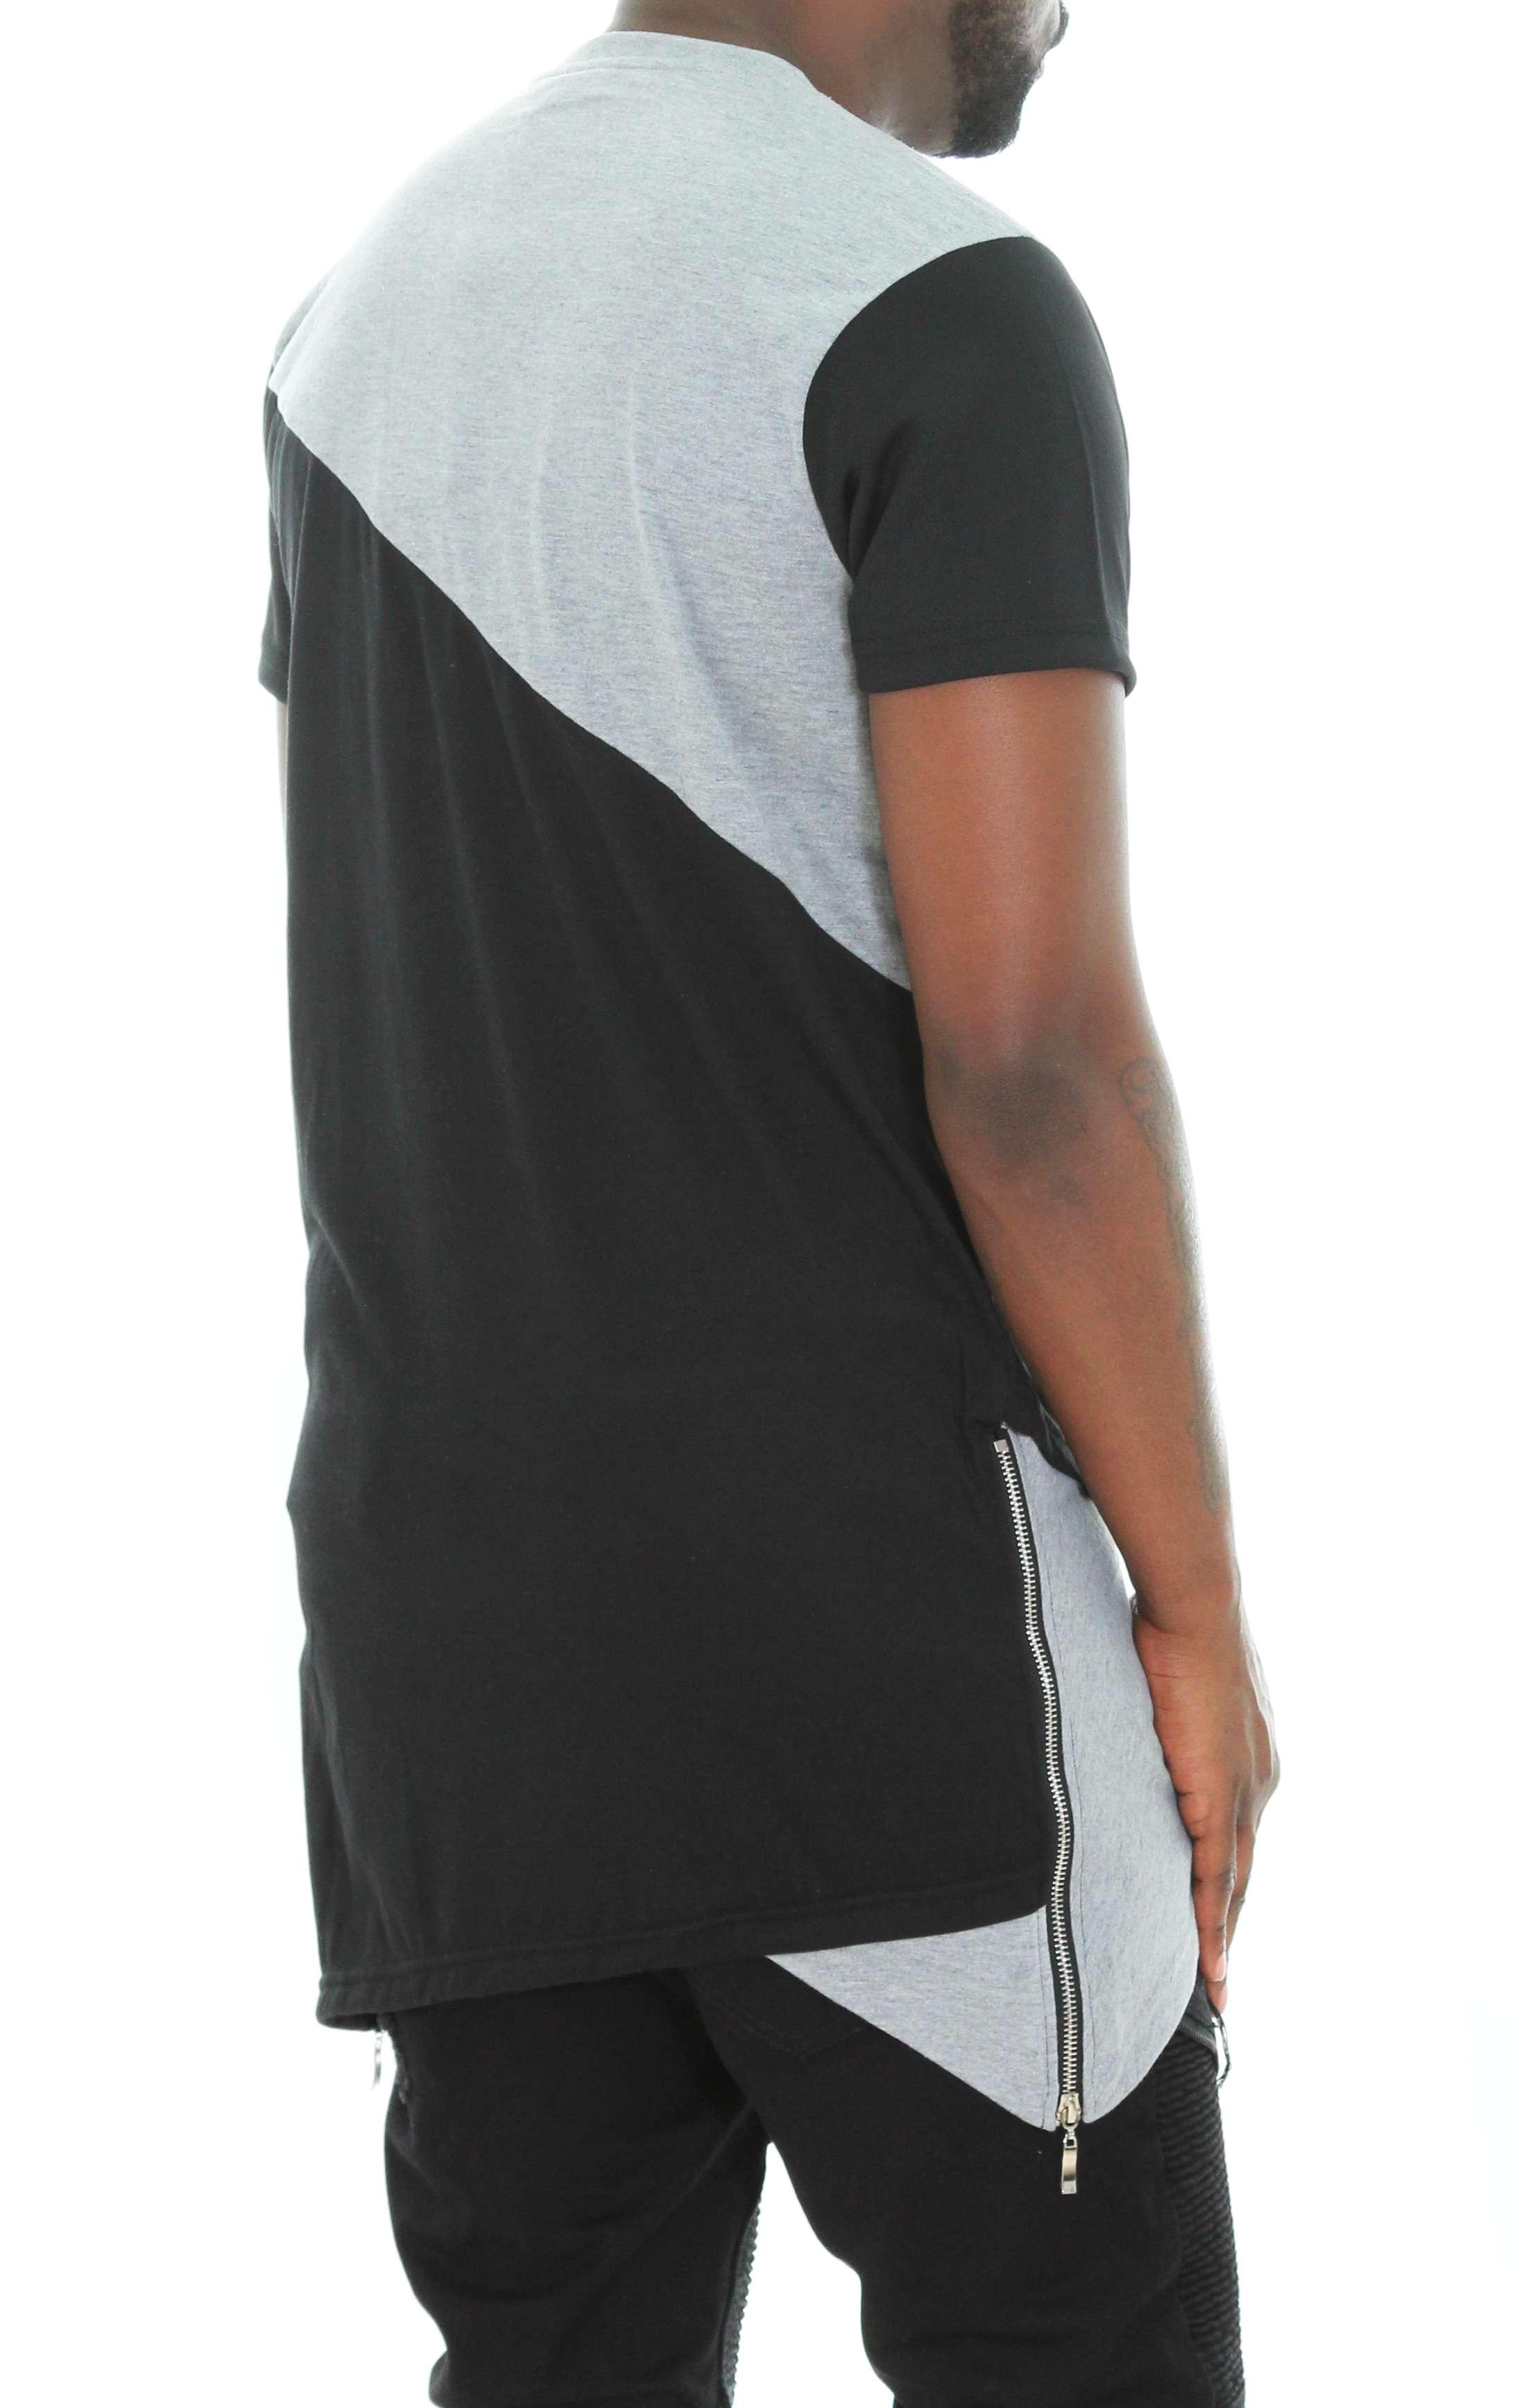 Imperious-Men-039-s-Colorblock-Asymmetric-Hem-Side-Zipper-Longline-T-Shirt thumbnail 6